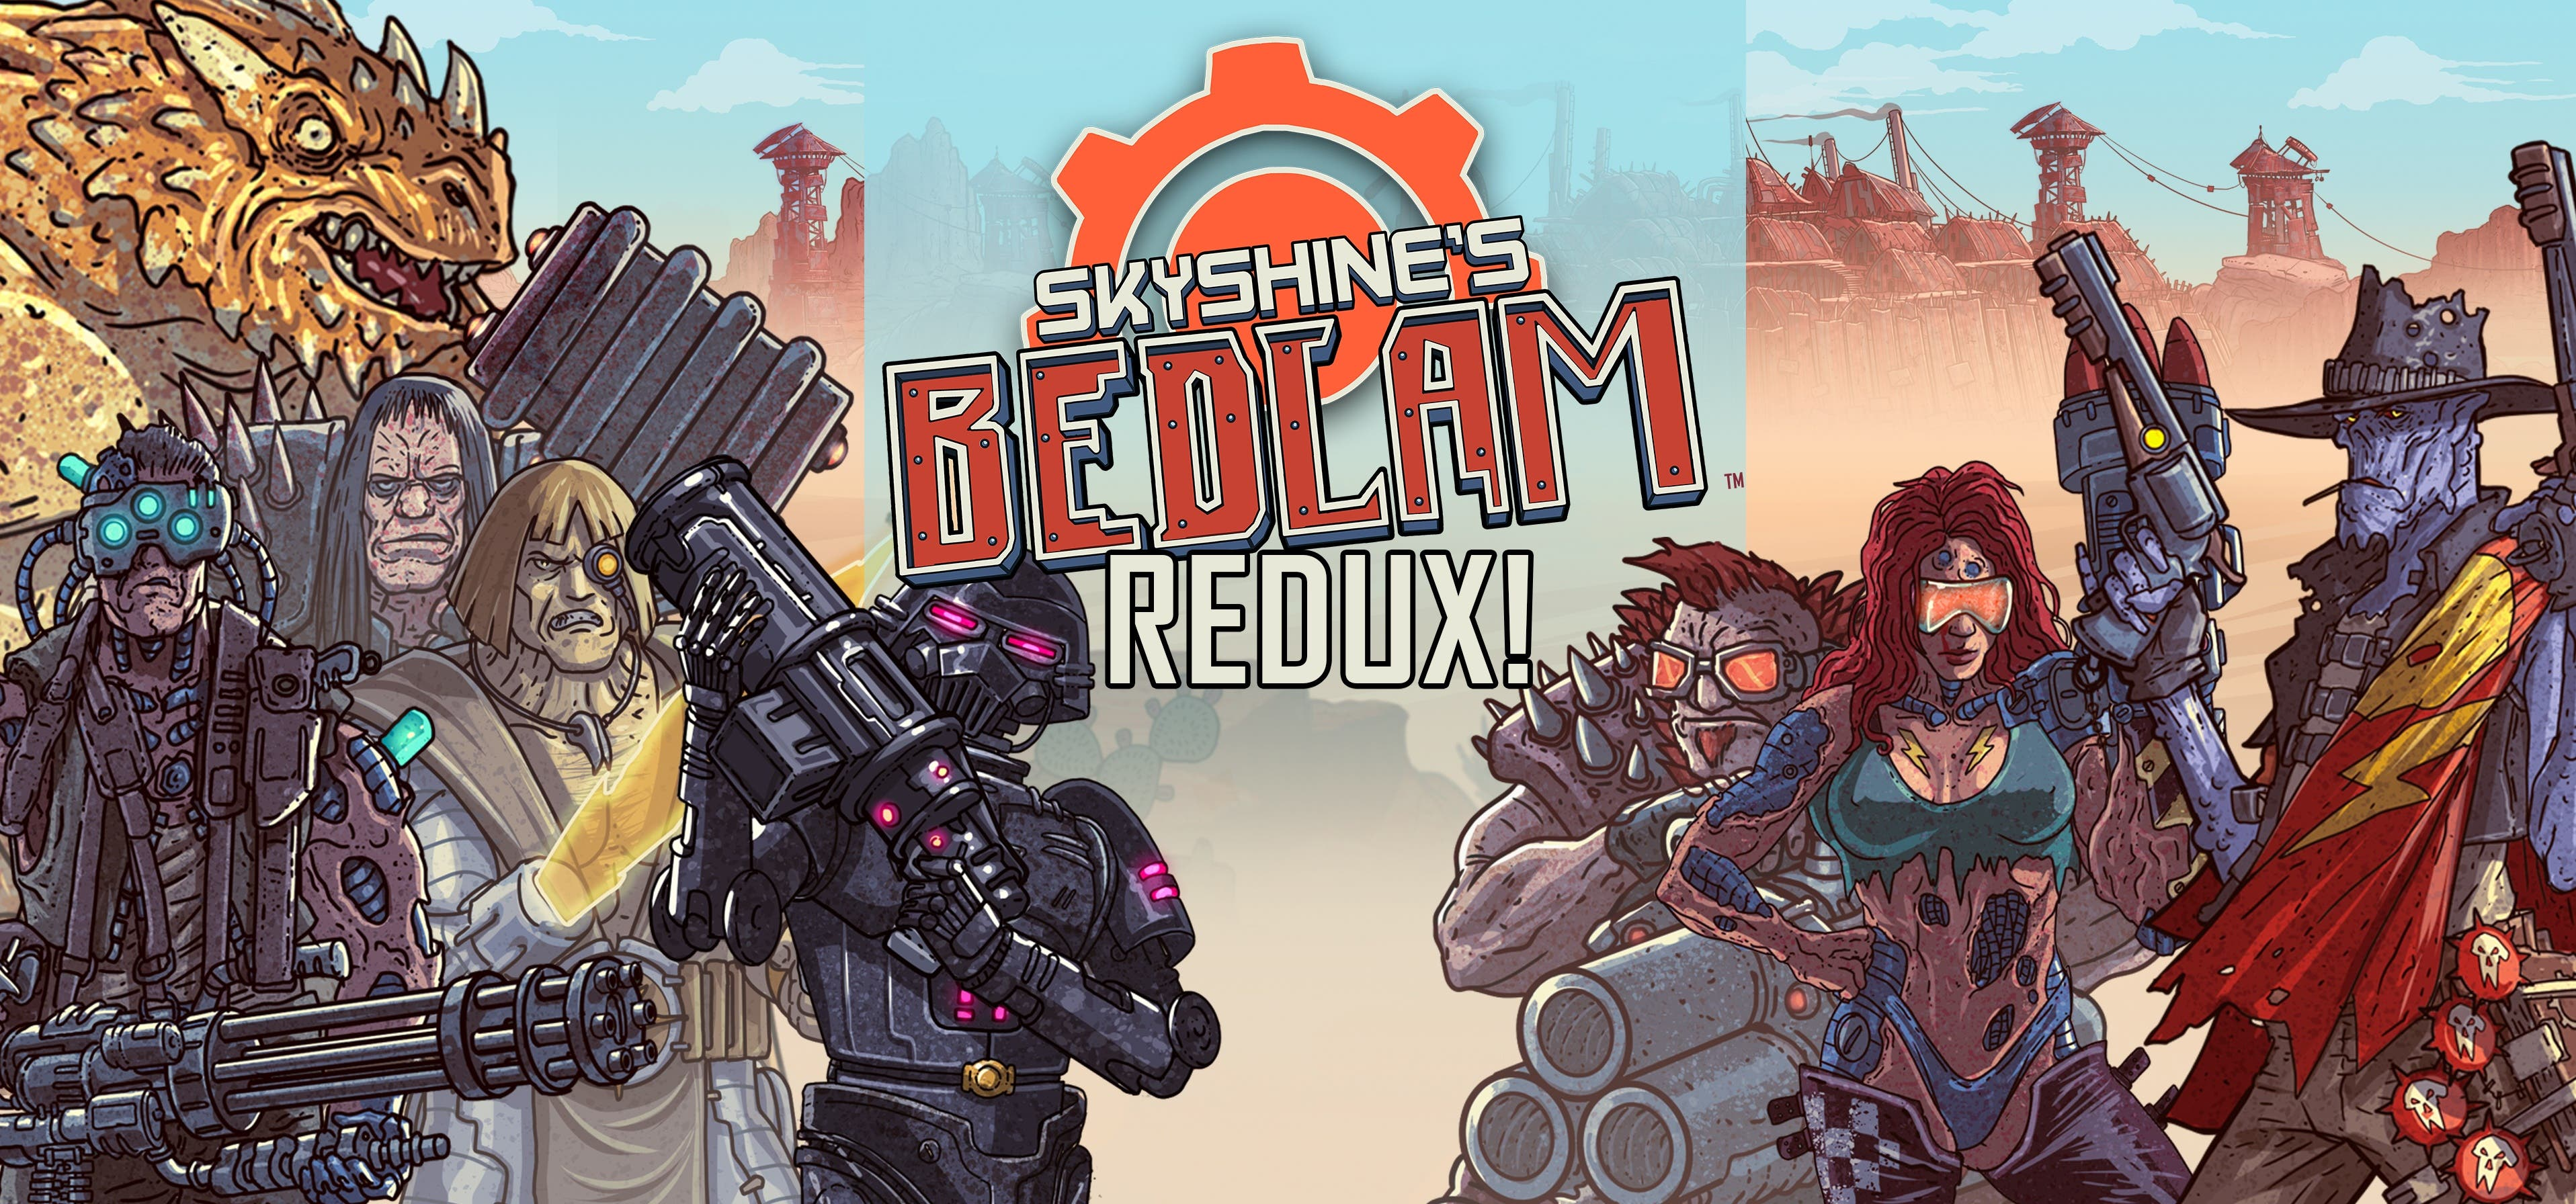 Keyart_skyshine_bedlam_redux